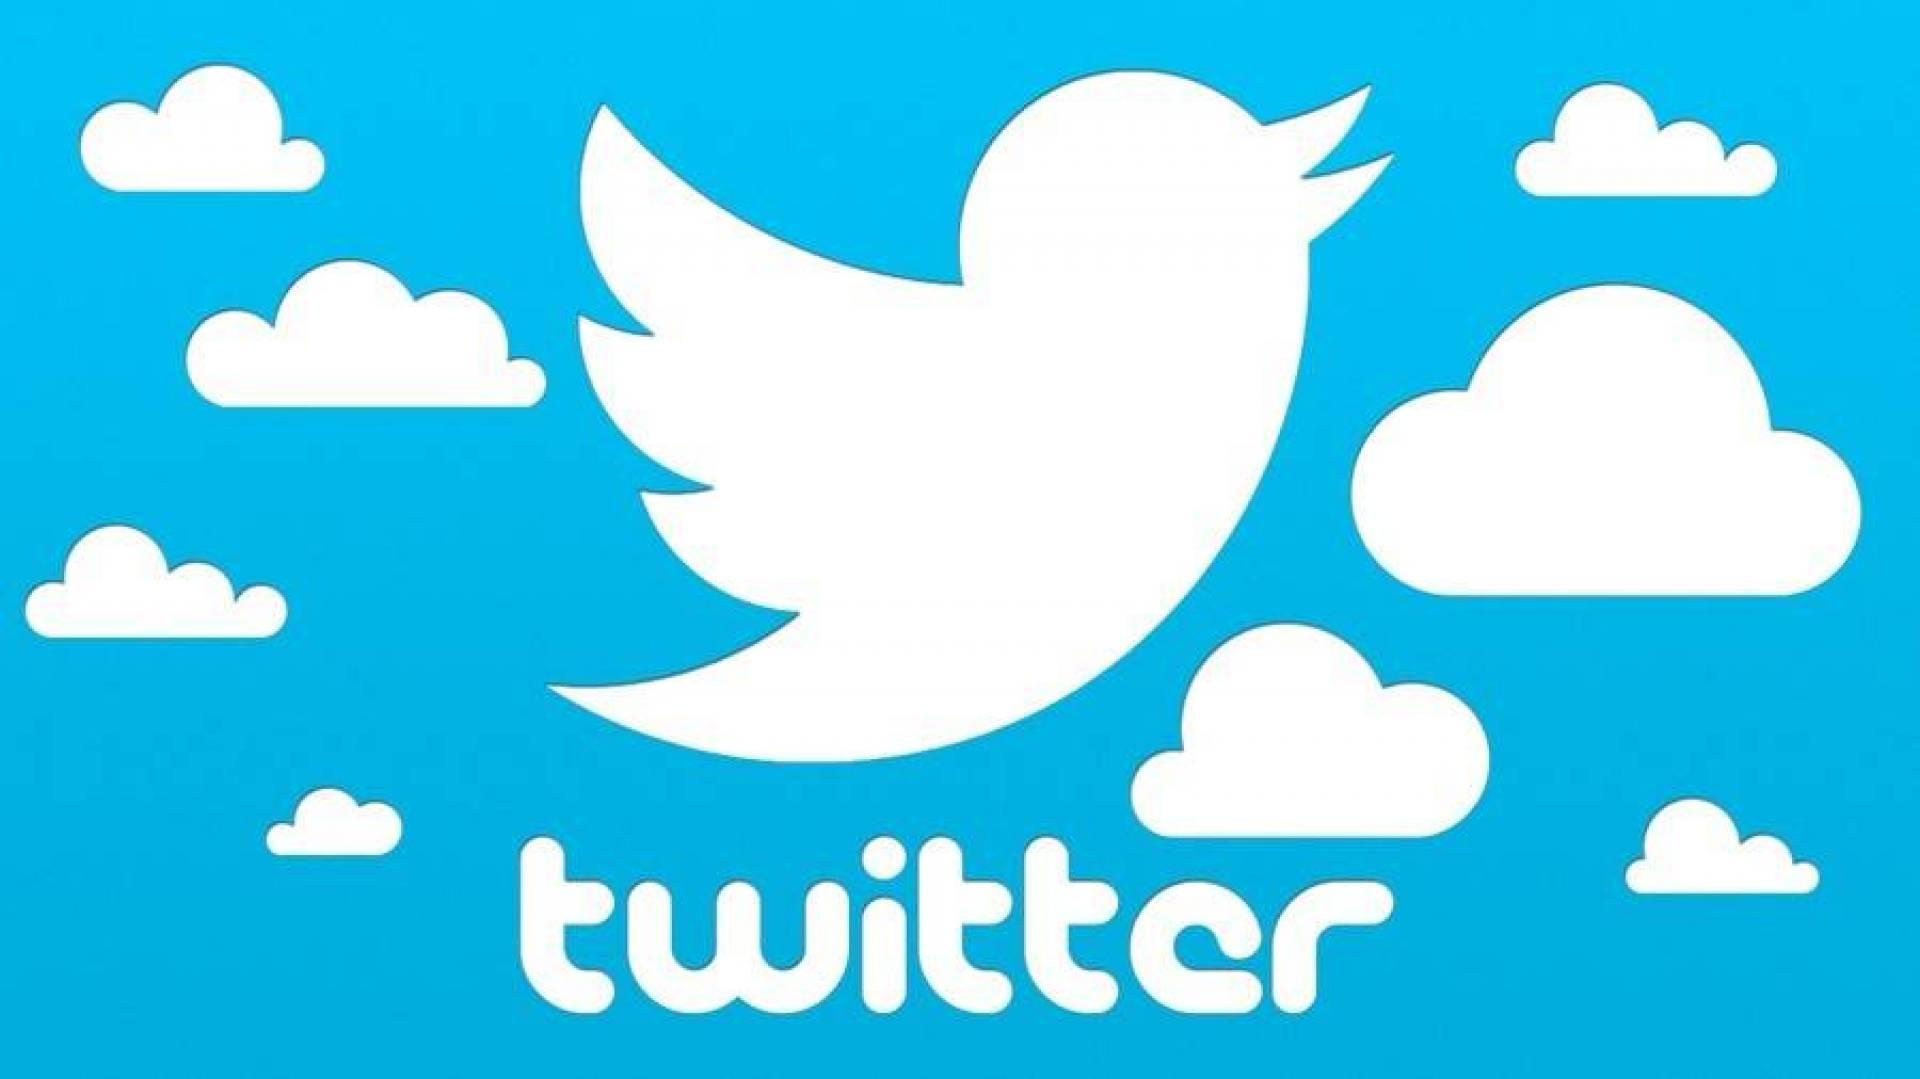 twitter 867525 highres - أداة مميزة مقدمة من تويتر تتيح لك إيجاد تغريداتك القديمة بكل سهولة.. شرح بالصور